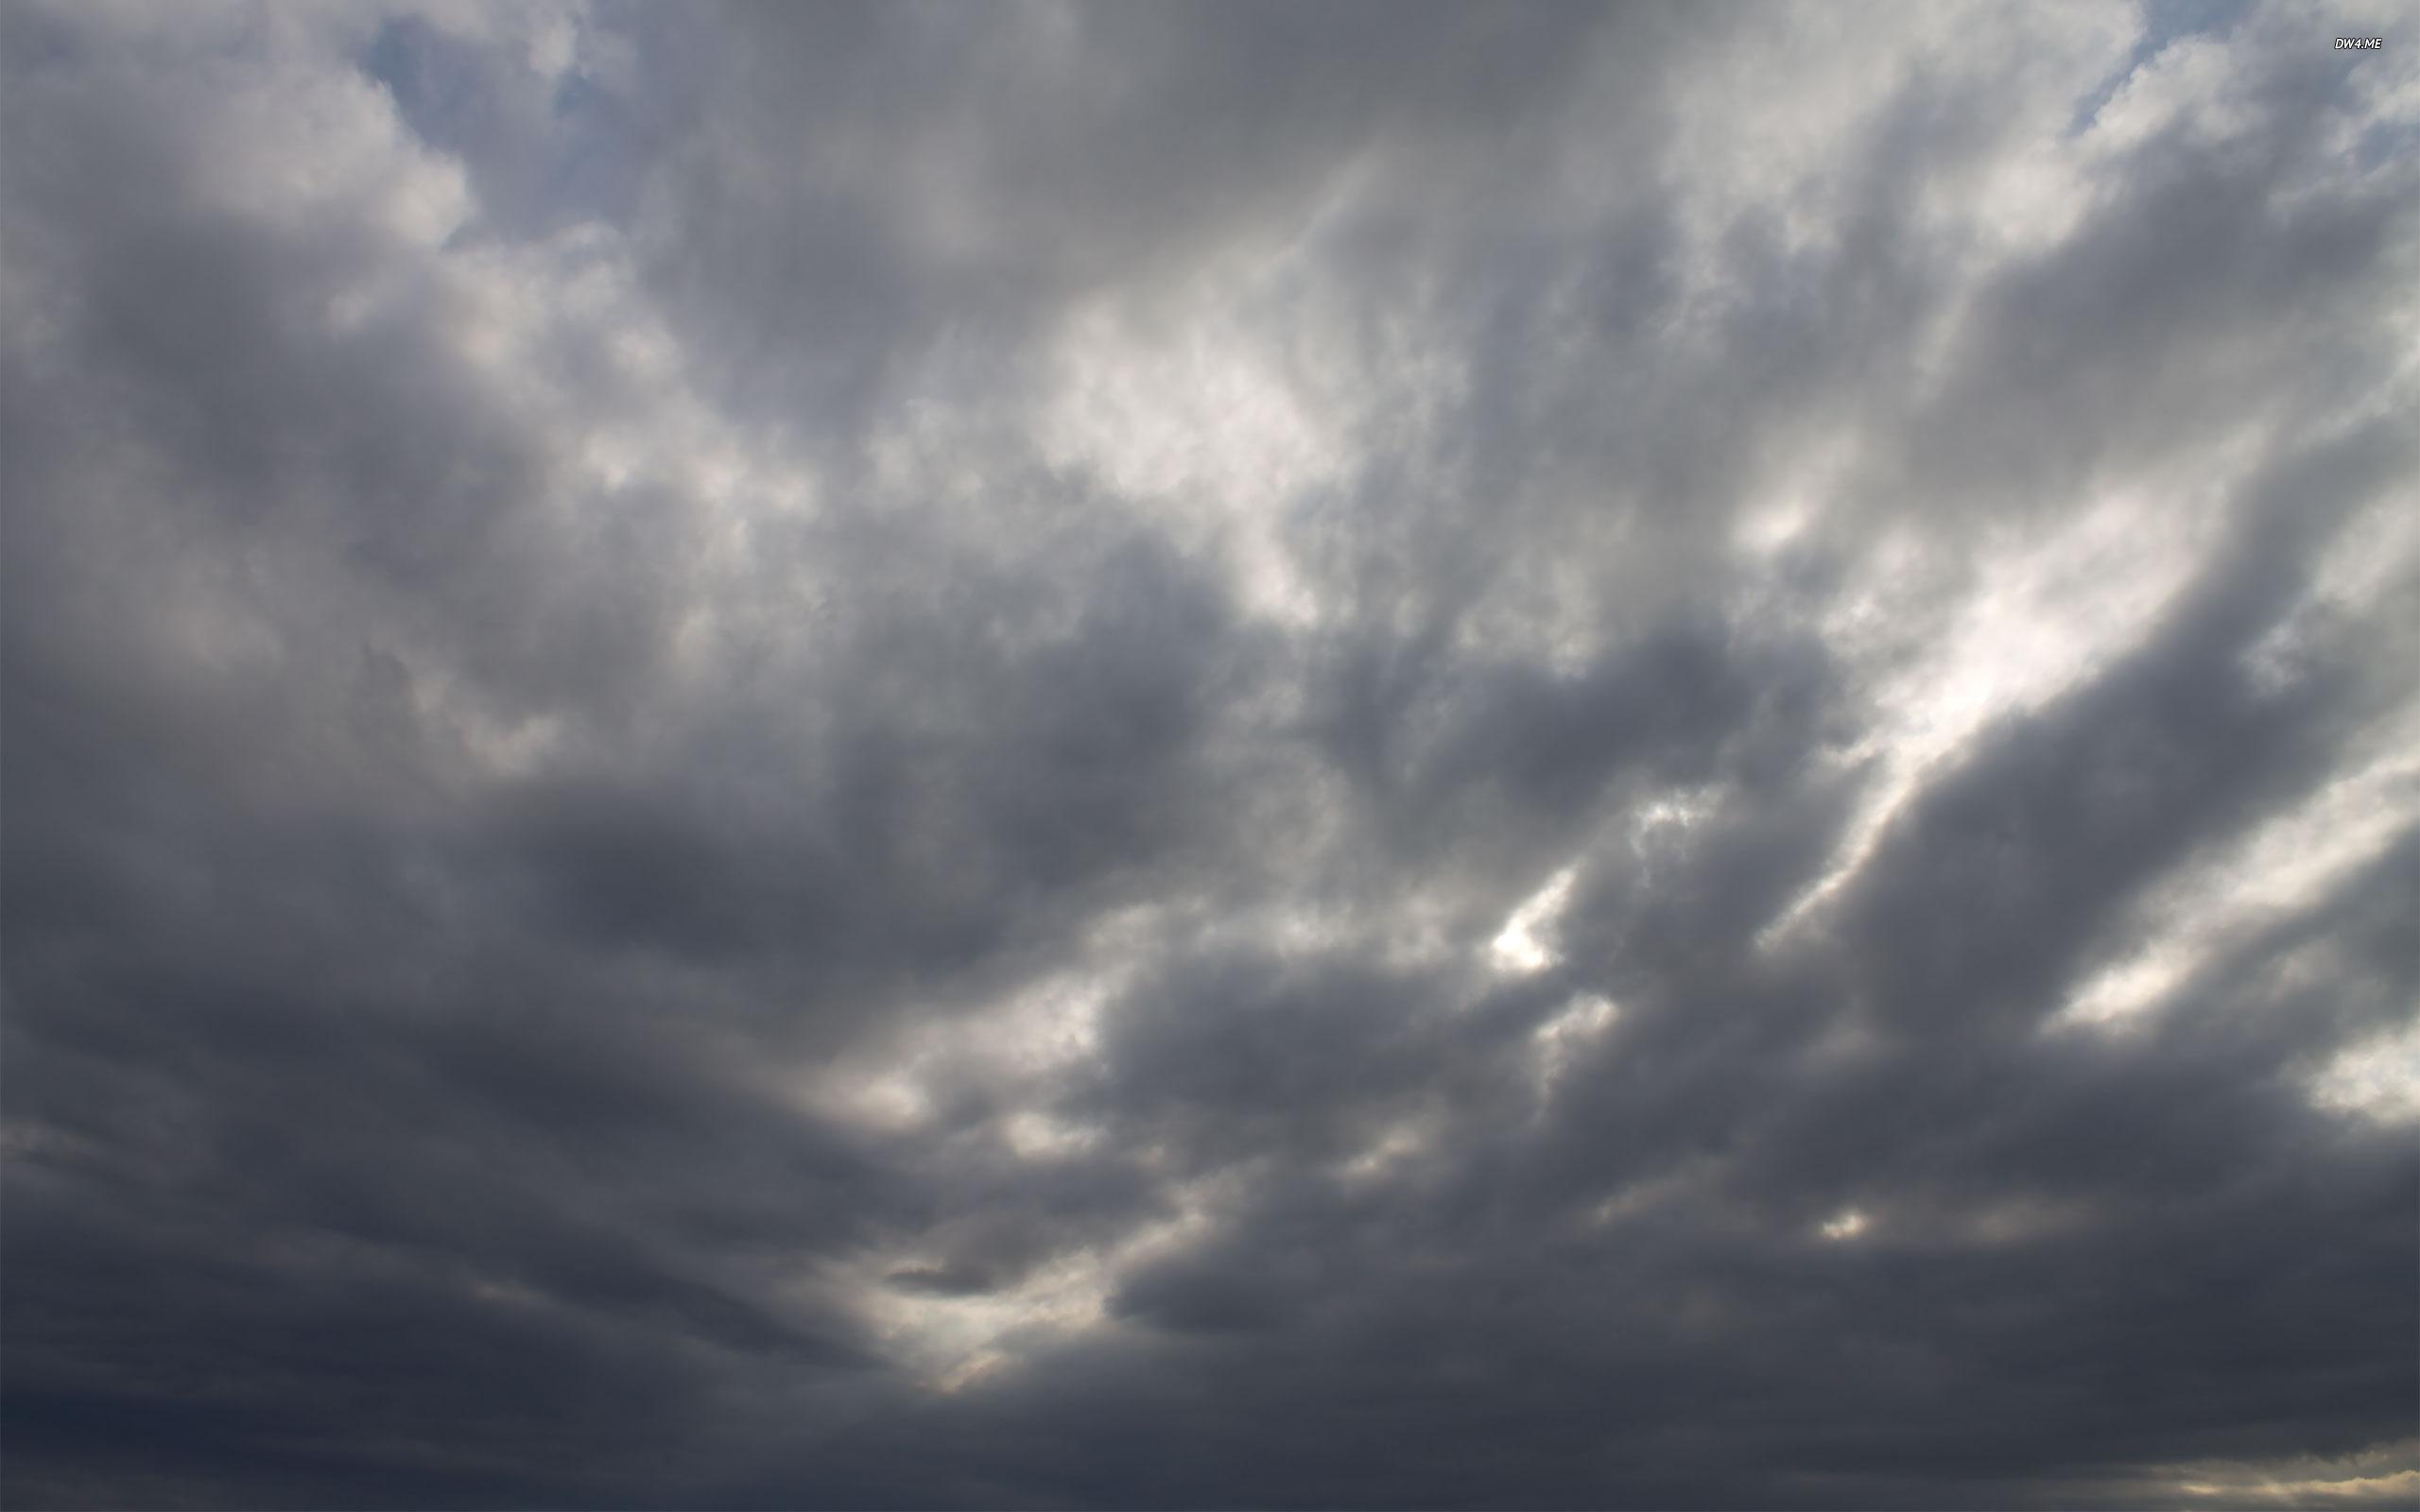 Rainy Season Wallpapers With Quotes Hd Rain Cloud Wallpaper Hd Pixelstalk Net